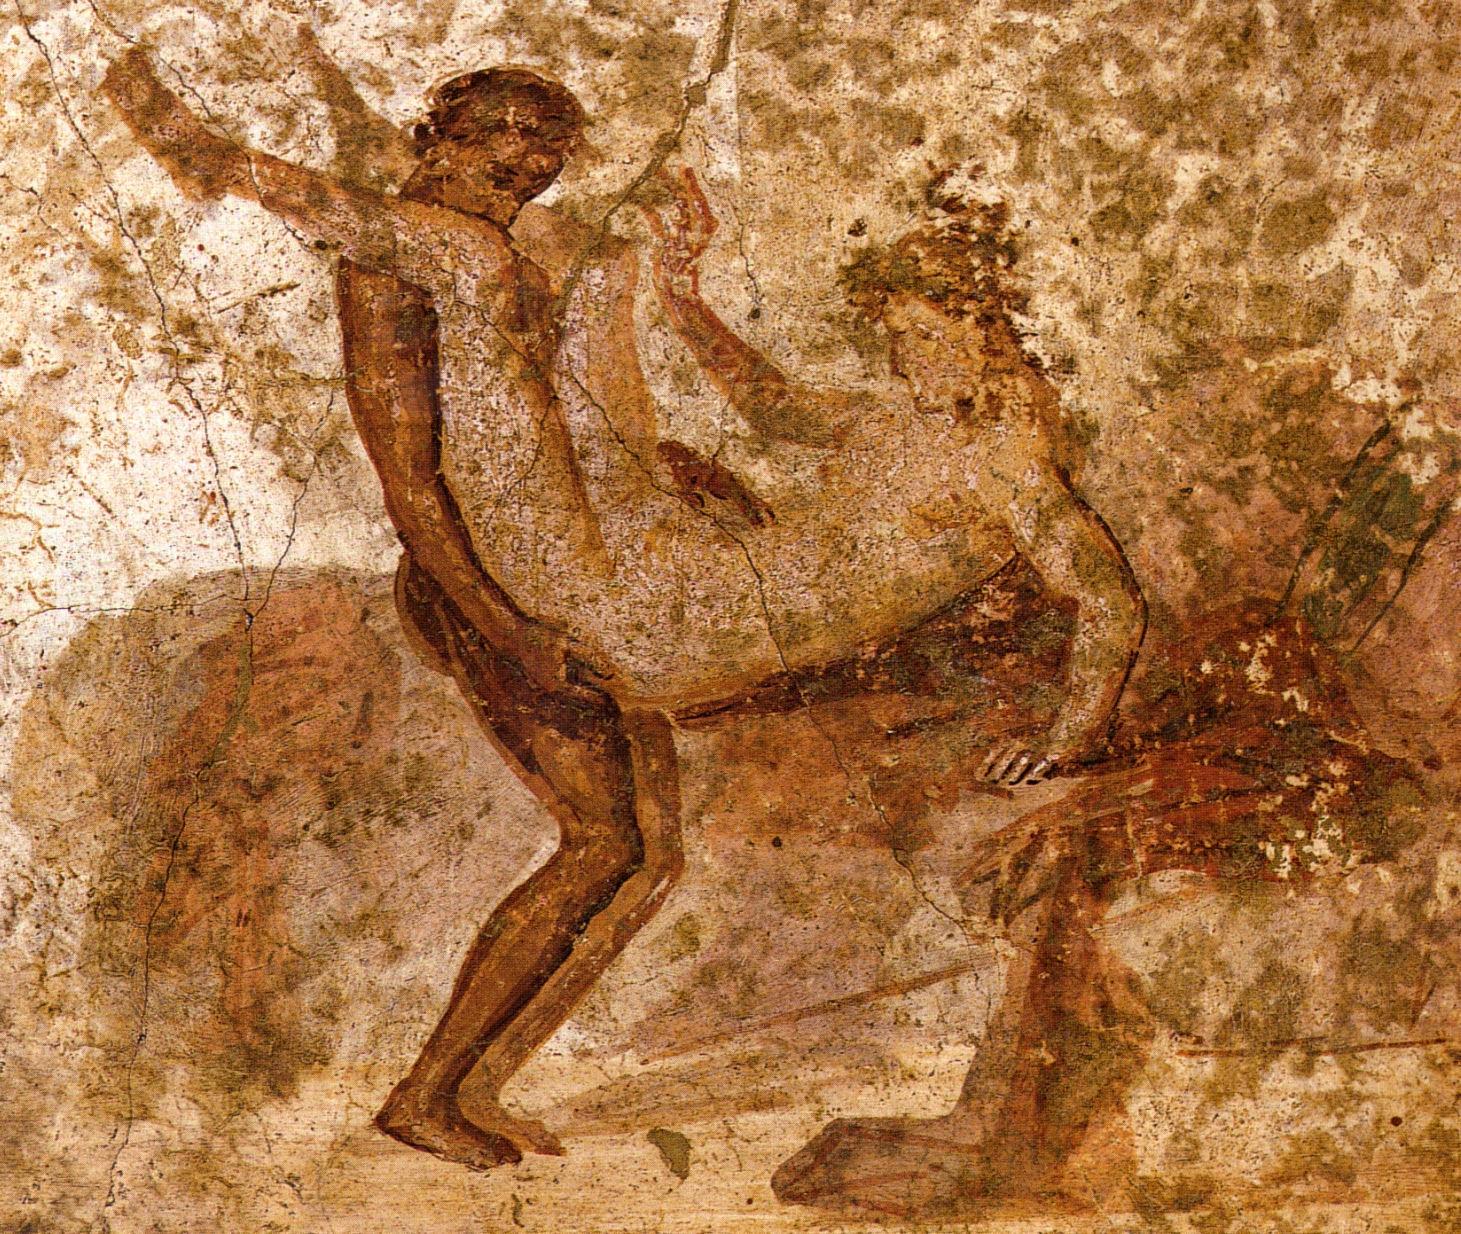 Pompeii_-_Erotic_Scene_2_-_MAN.jpg